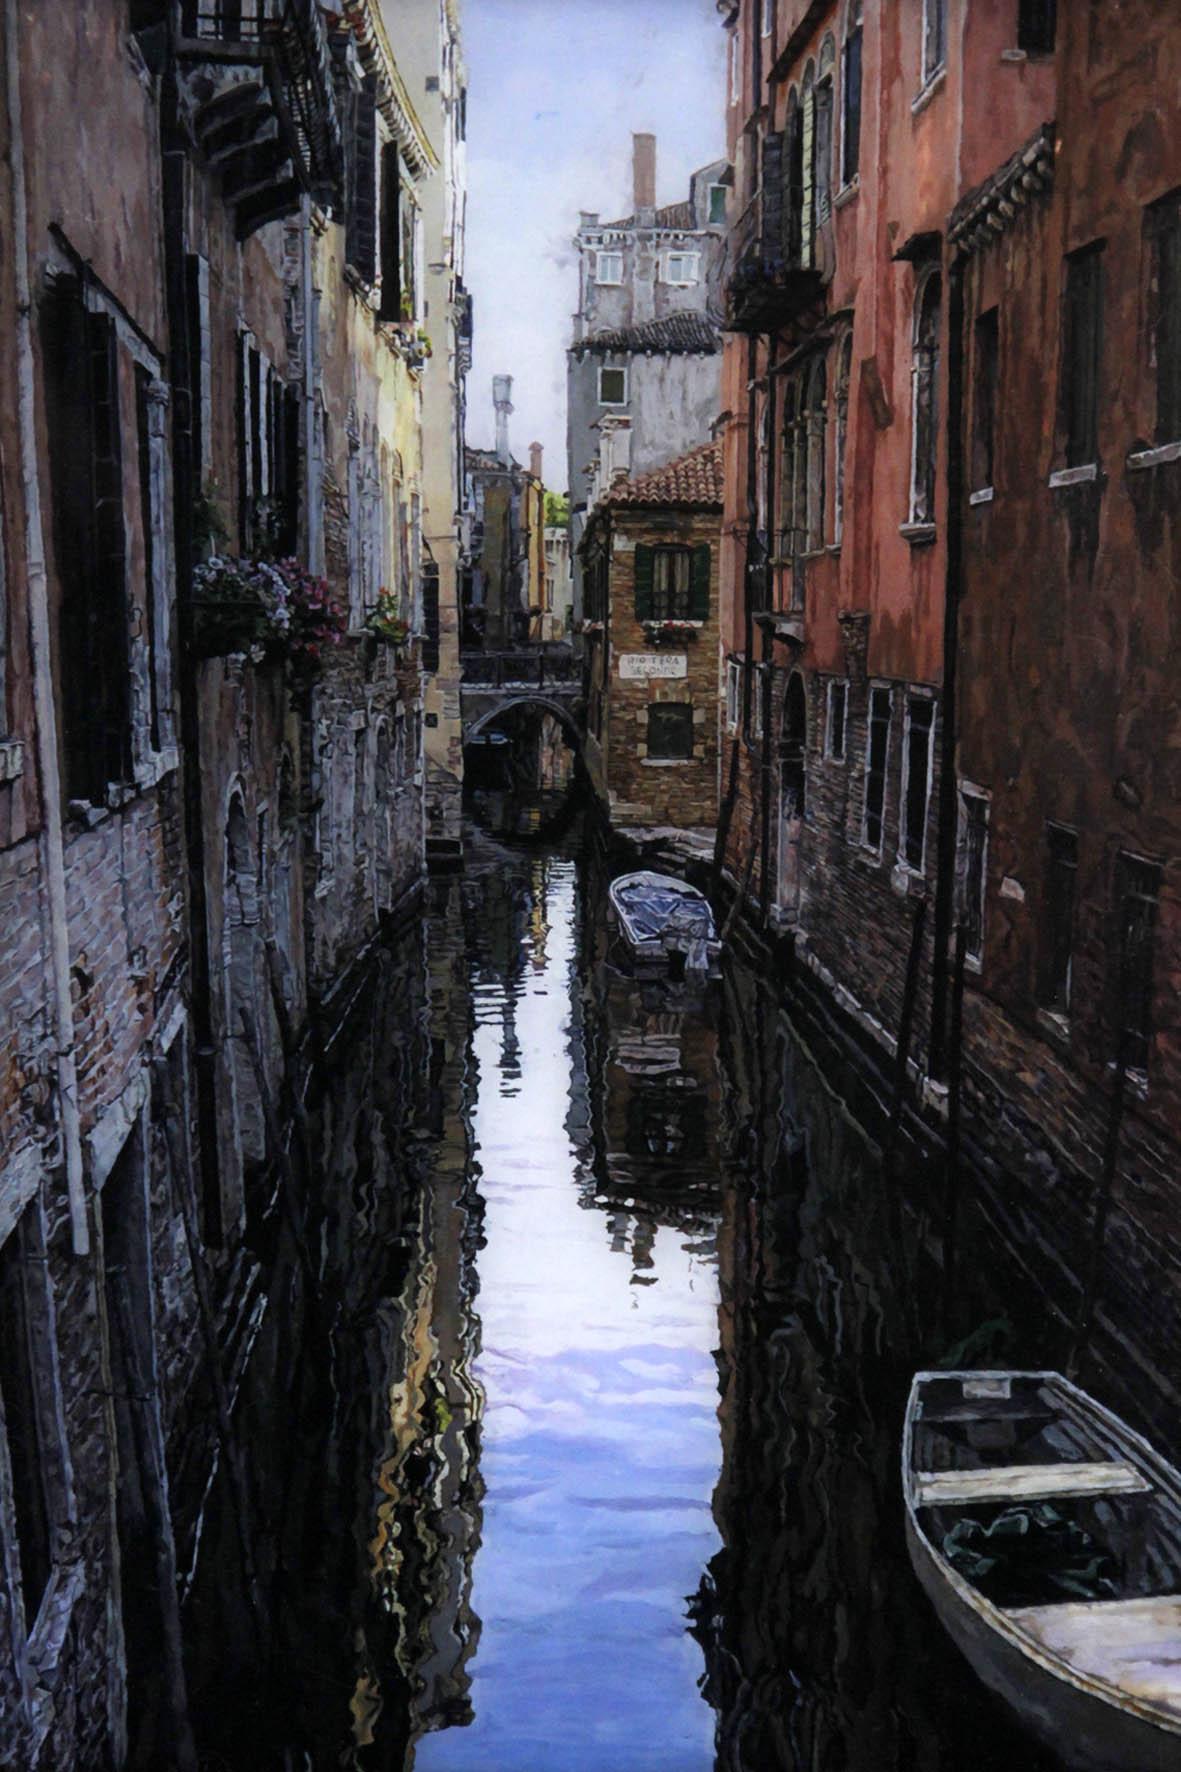 venecianskiy-kanal-35h42sm